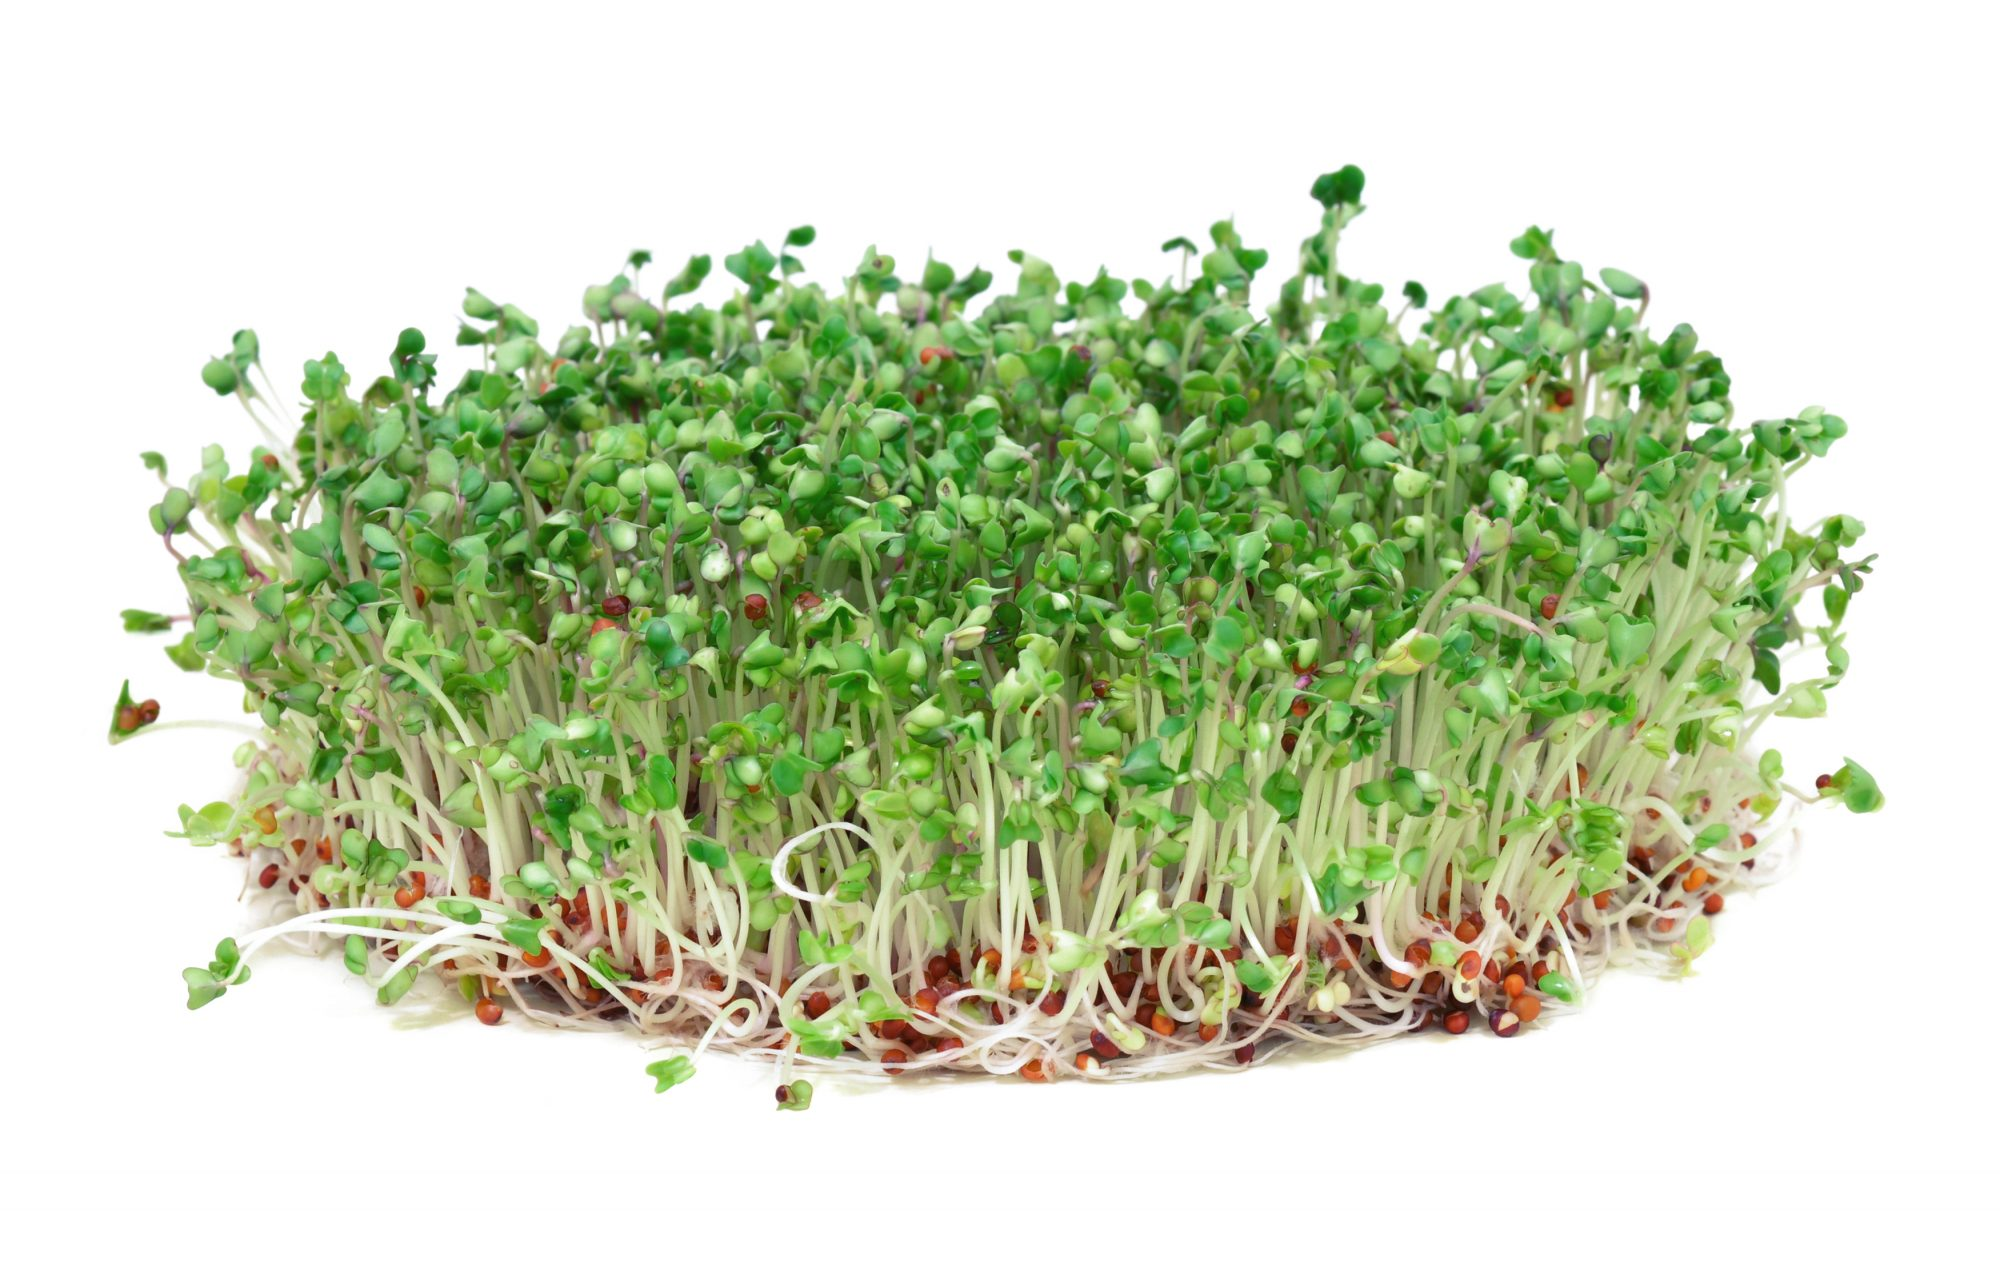 getty-broccoli-sprouts-image